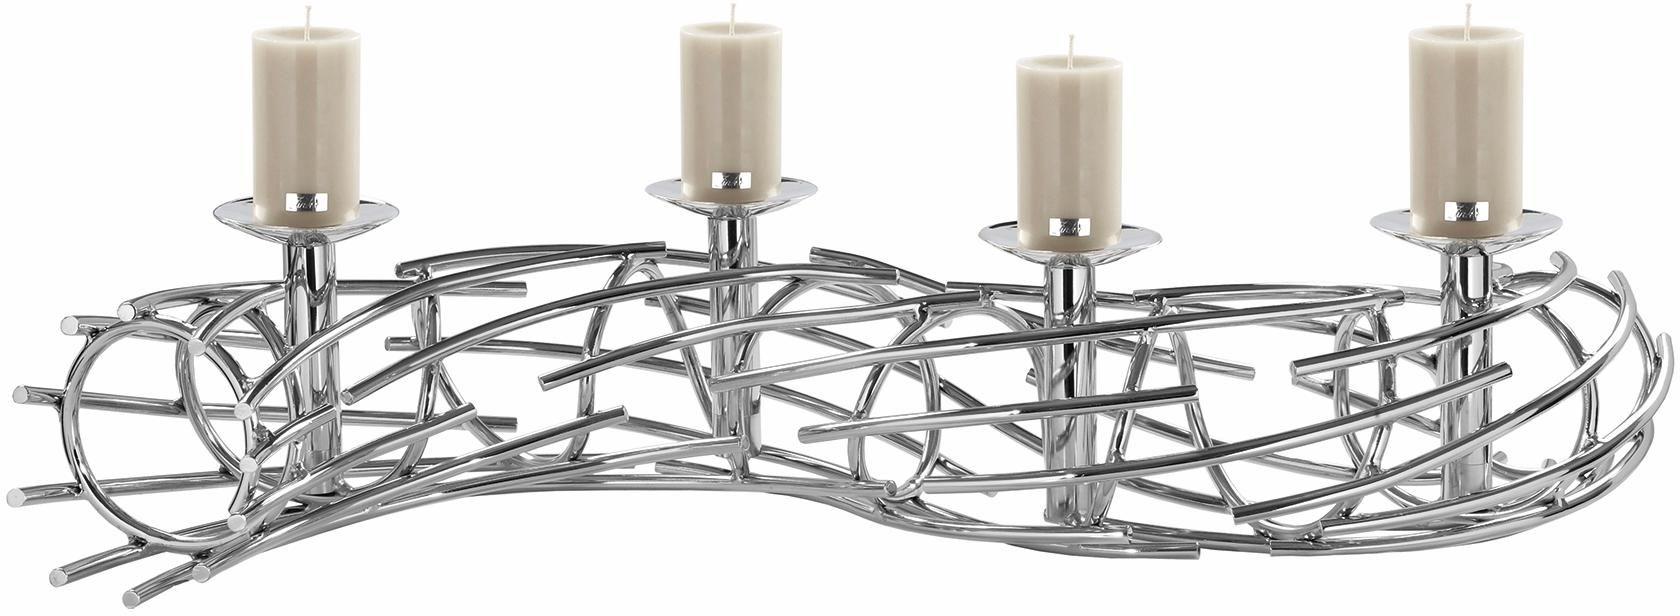 FINK Fink Kerzenständer »CORONA« 4-flammig